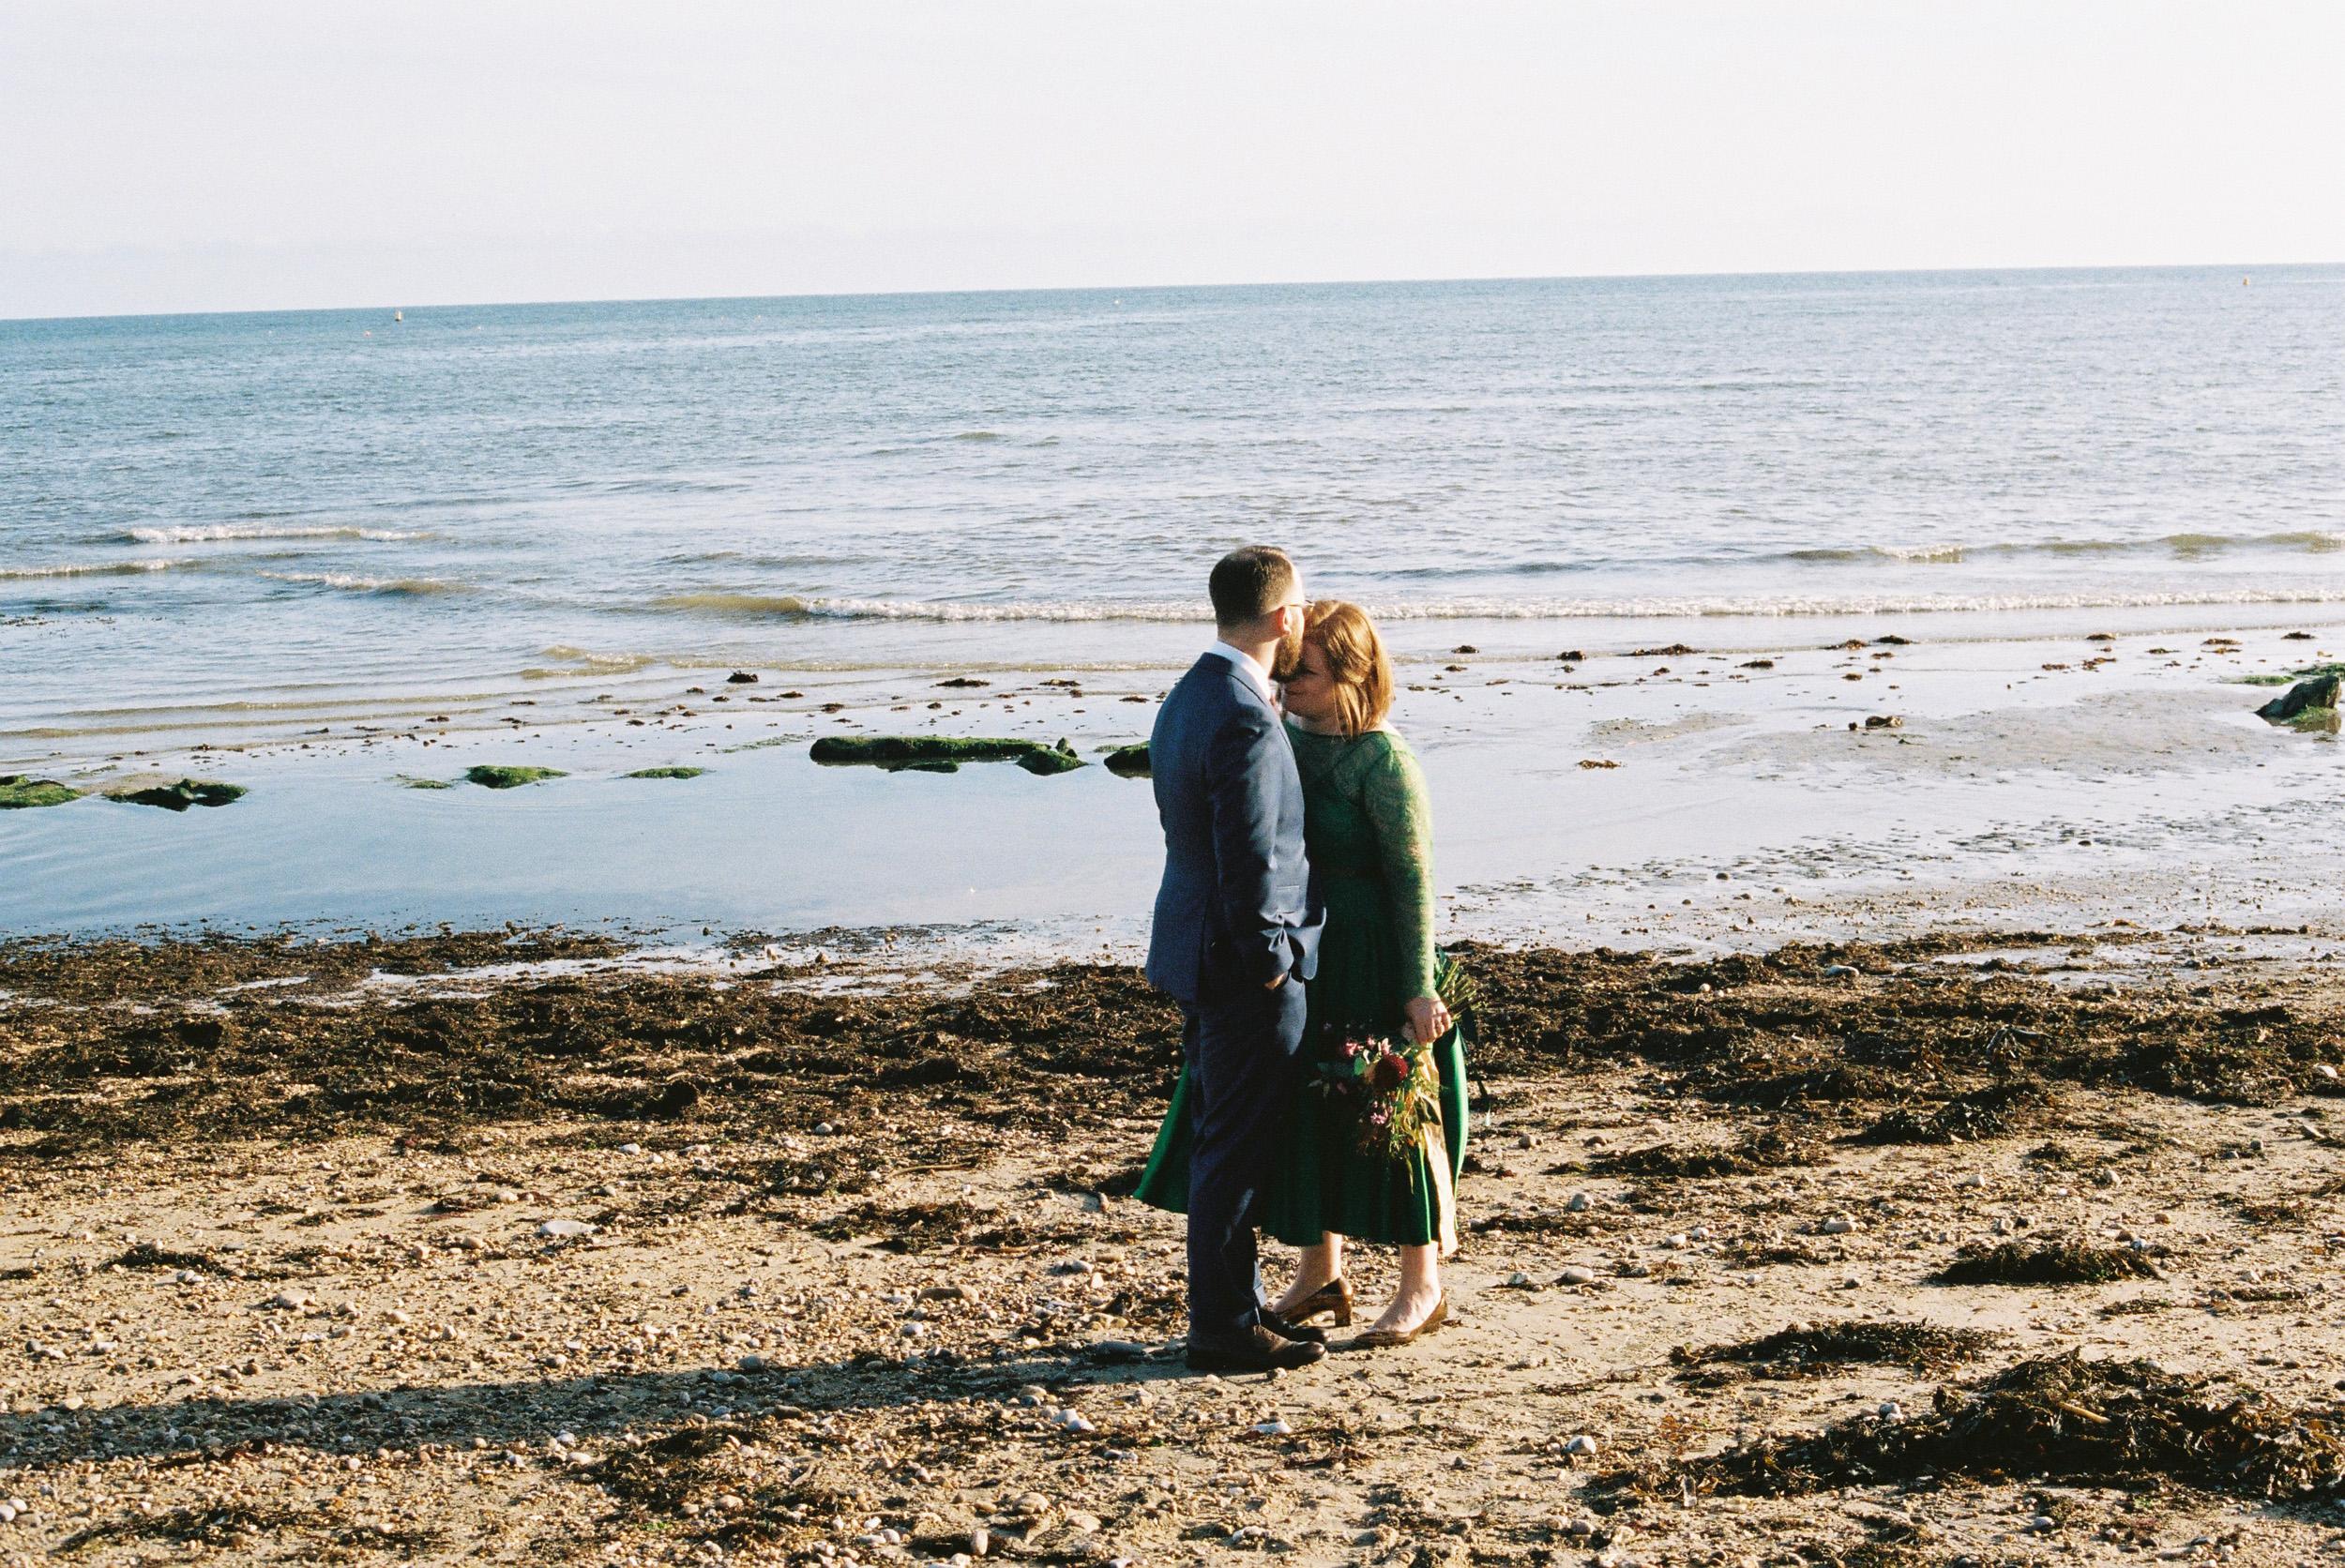 Lucy-Bespoke-Green-Silk-Lace-Wedding-Dress-Kate-Beaumont-Sheffield-21.jpg